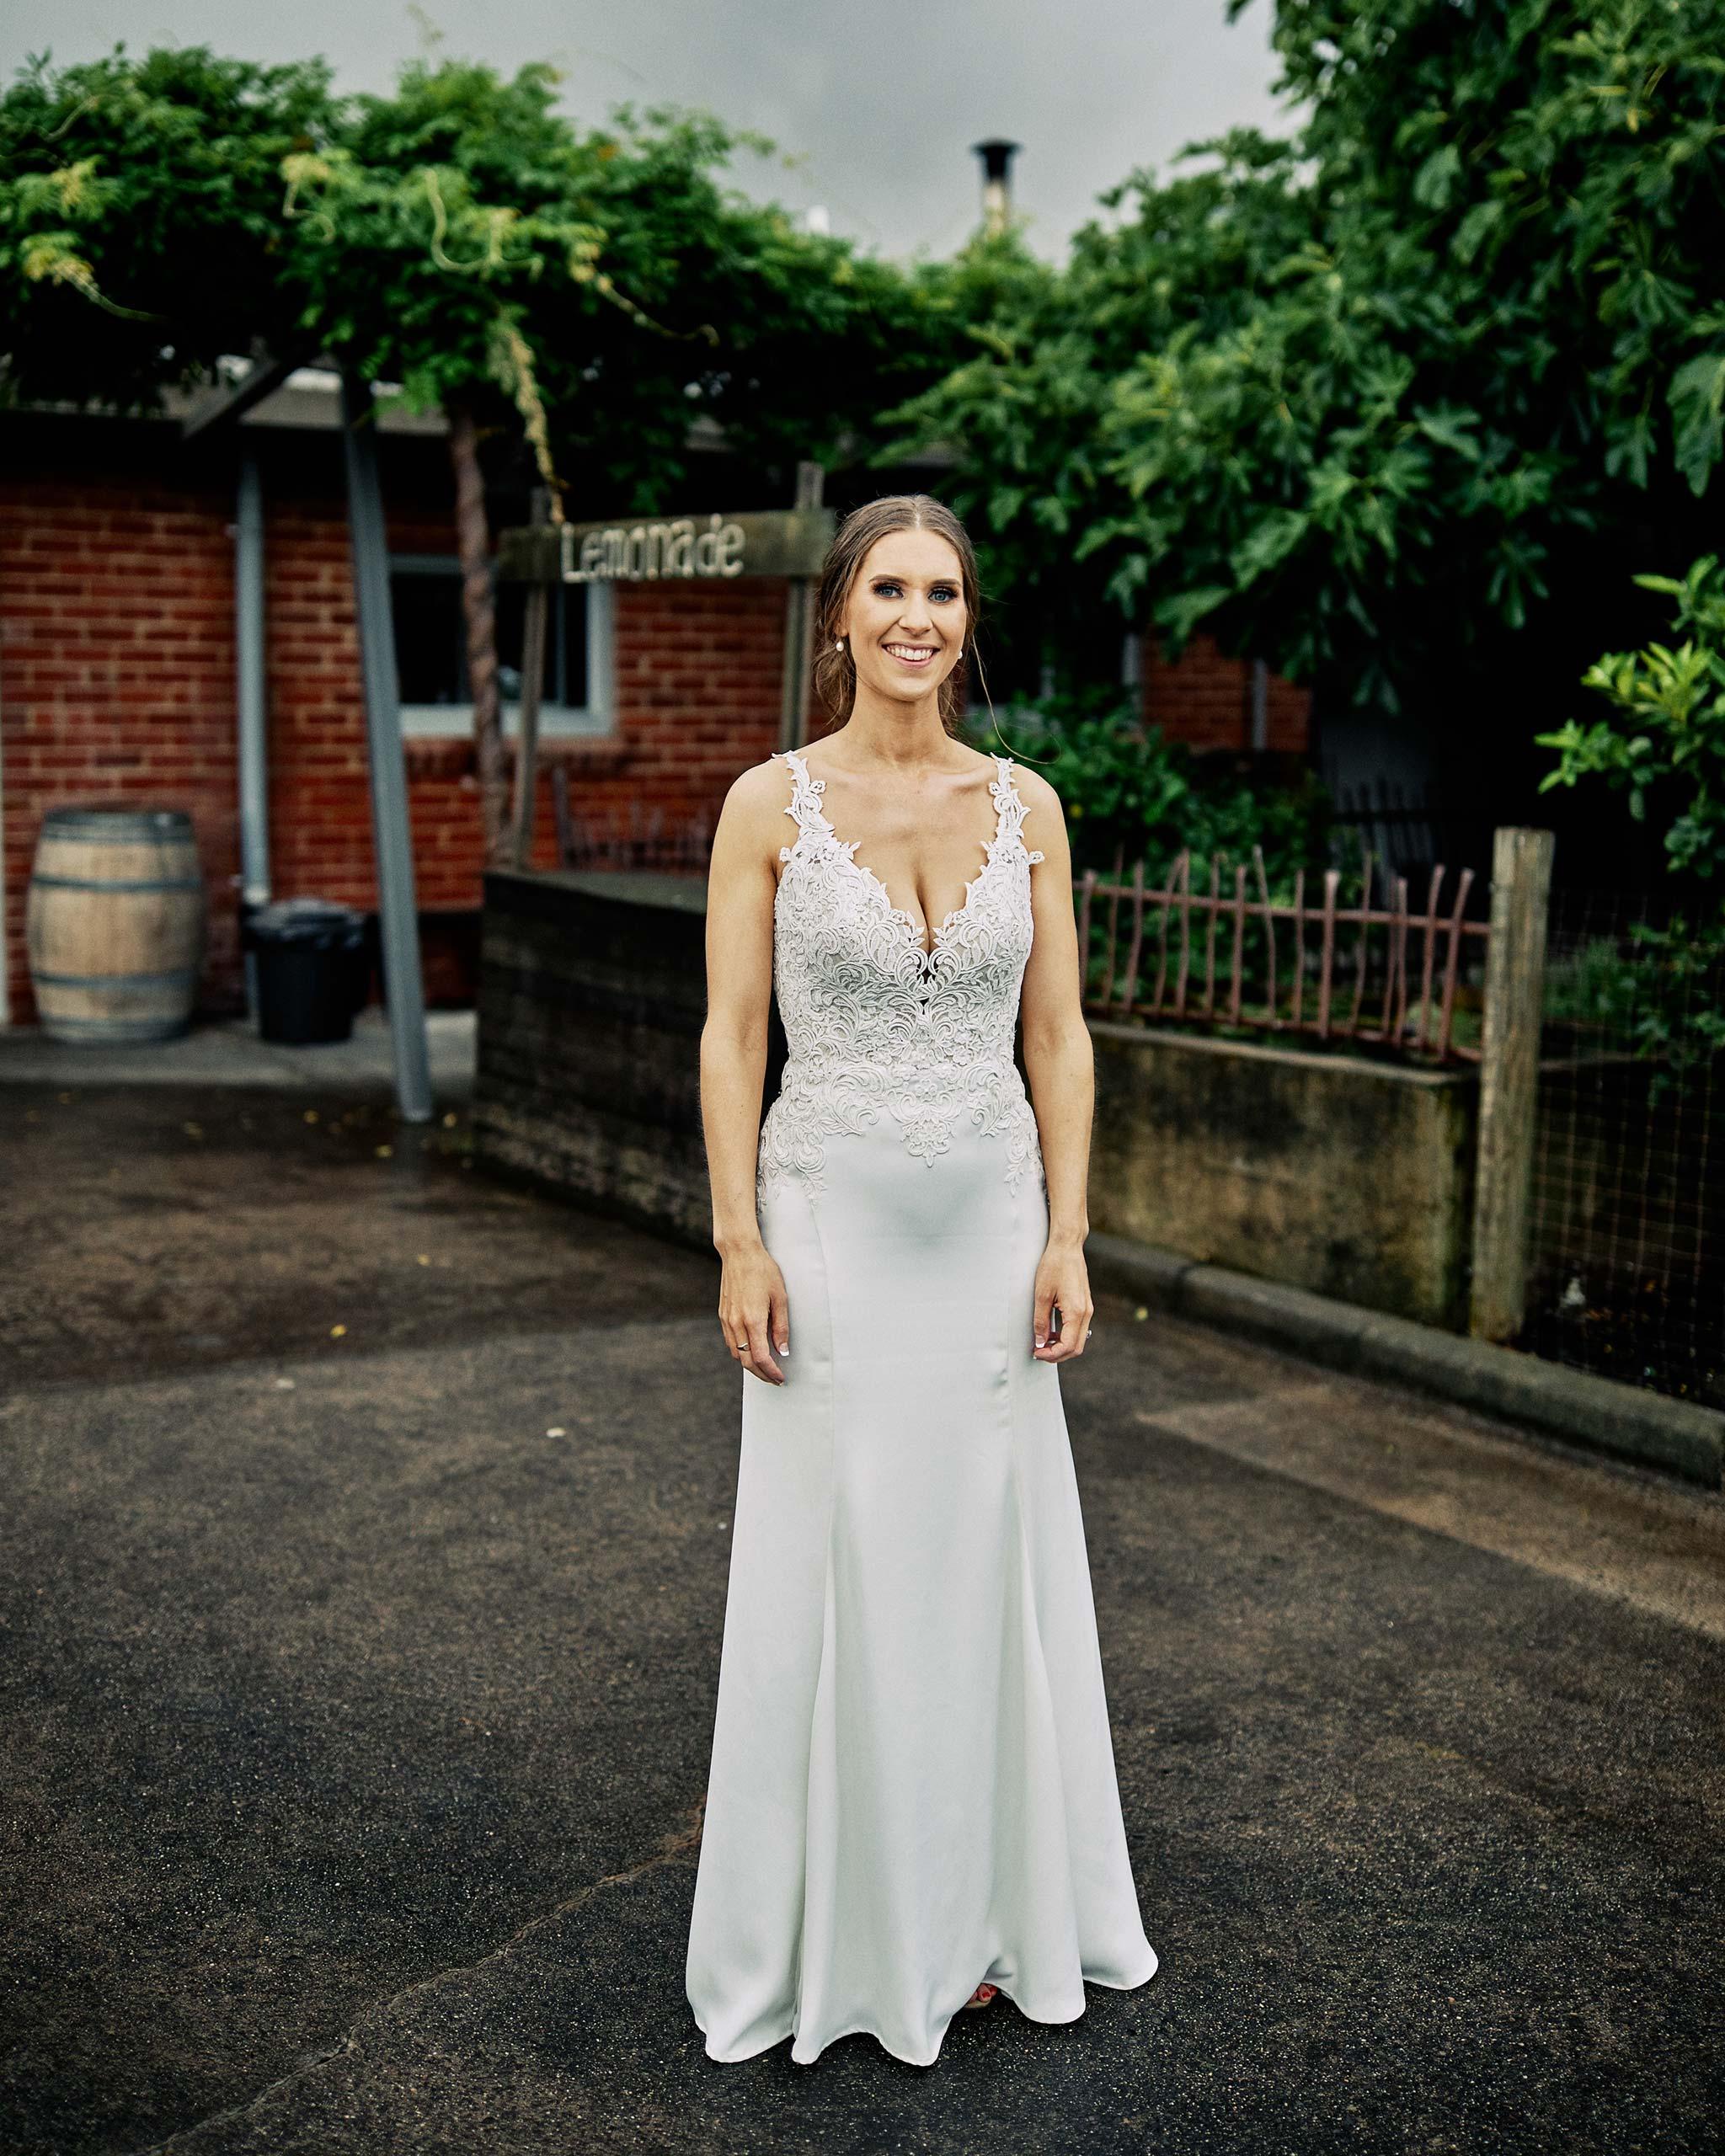 zonzo wedding photography reception bride full portrait